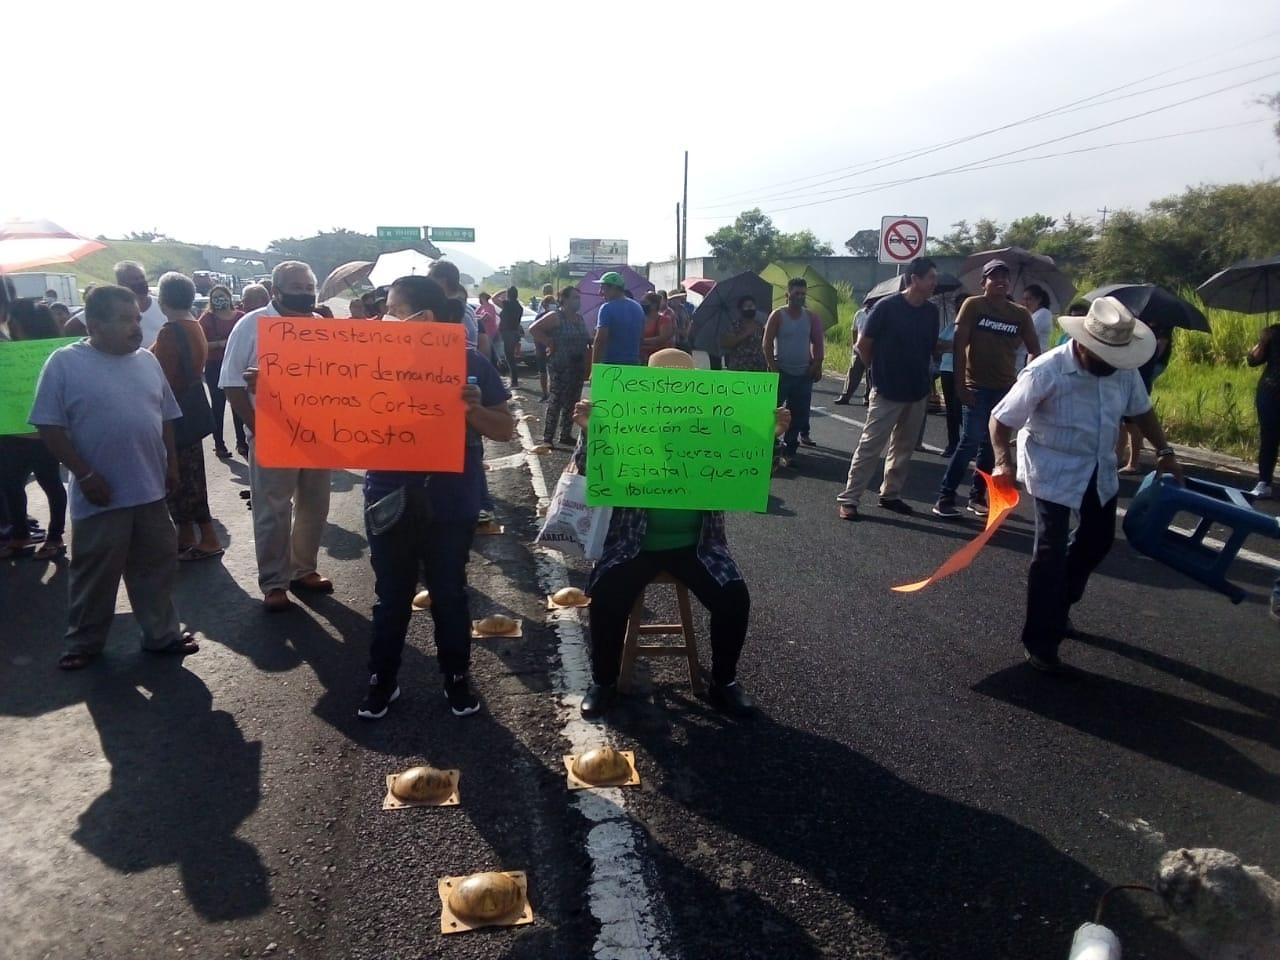 Manifestantes bloquearon la carretera Xalapa-Veracruz a la altura de Cerro Gordo